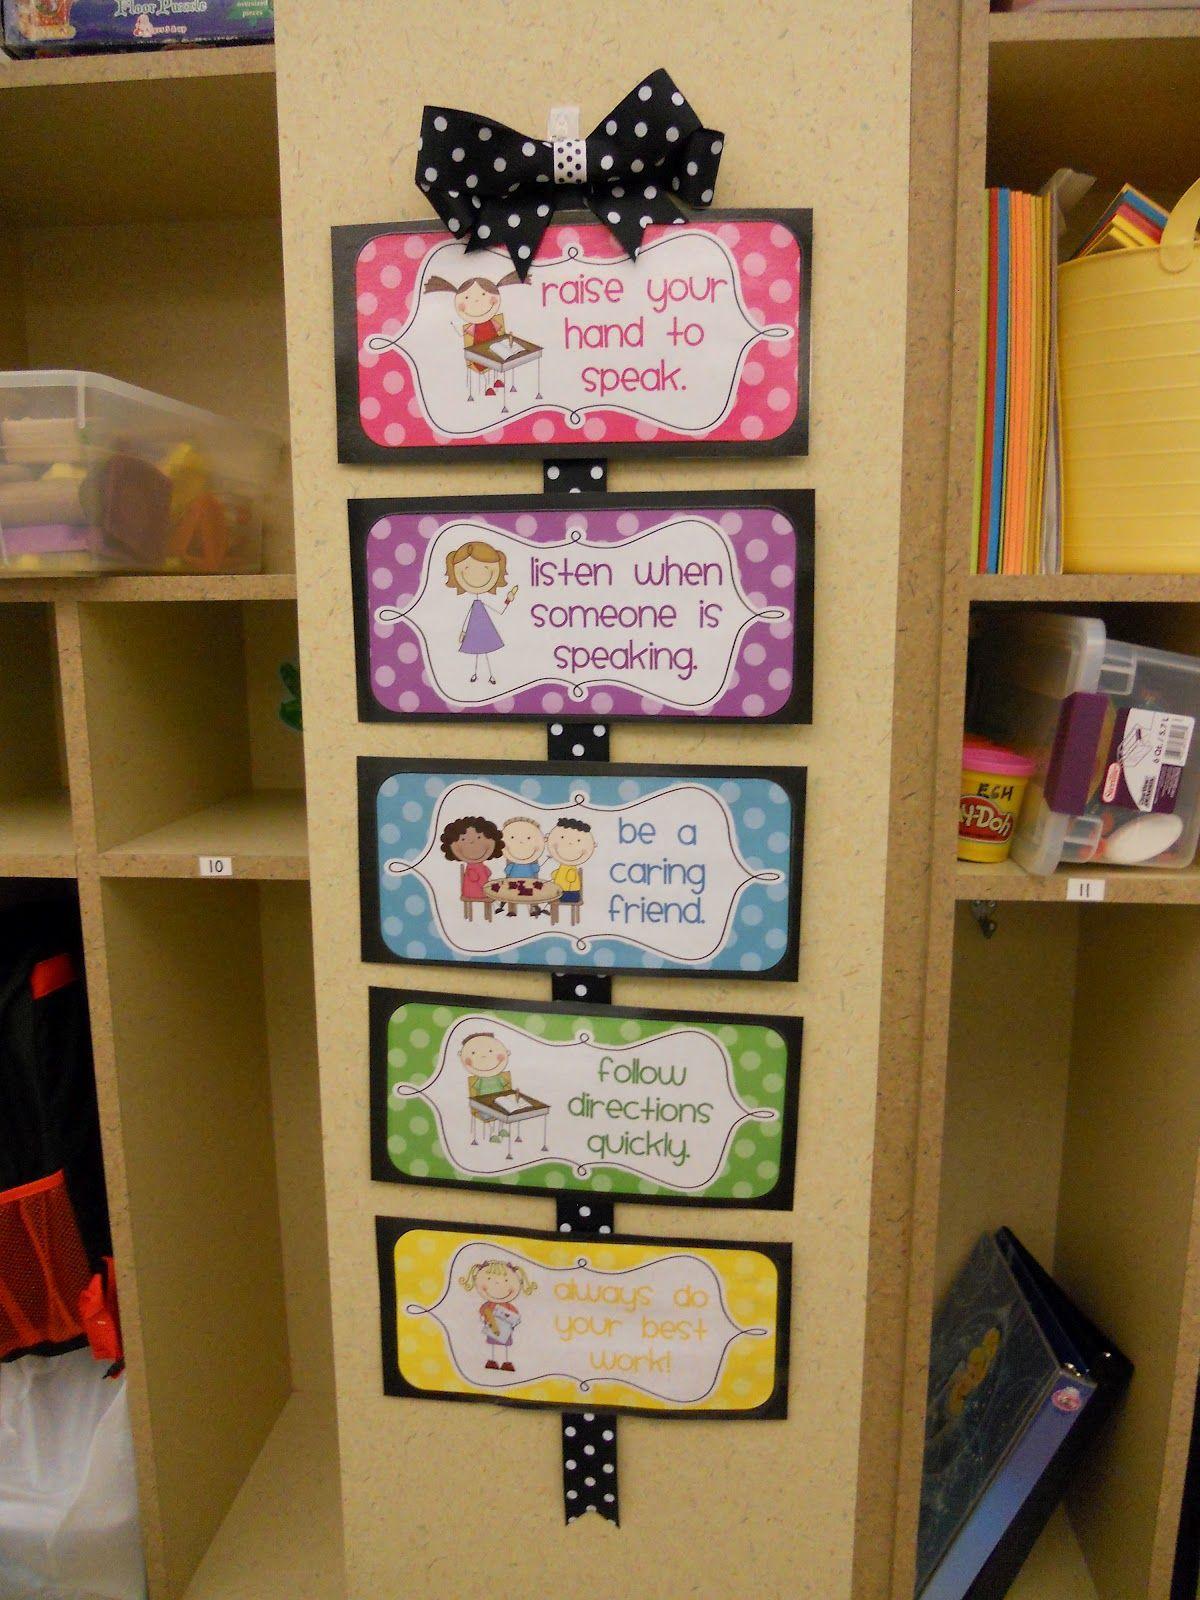 Preschool classroom rules crayons paper kindergarten and behavior chart also wall decoration for kids nursery part time rh pinterest